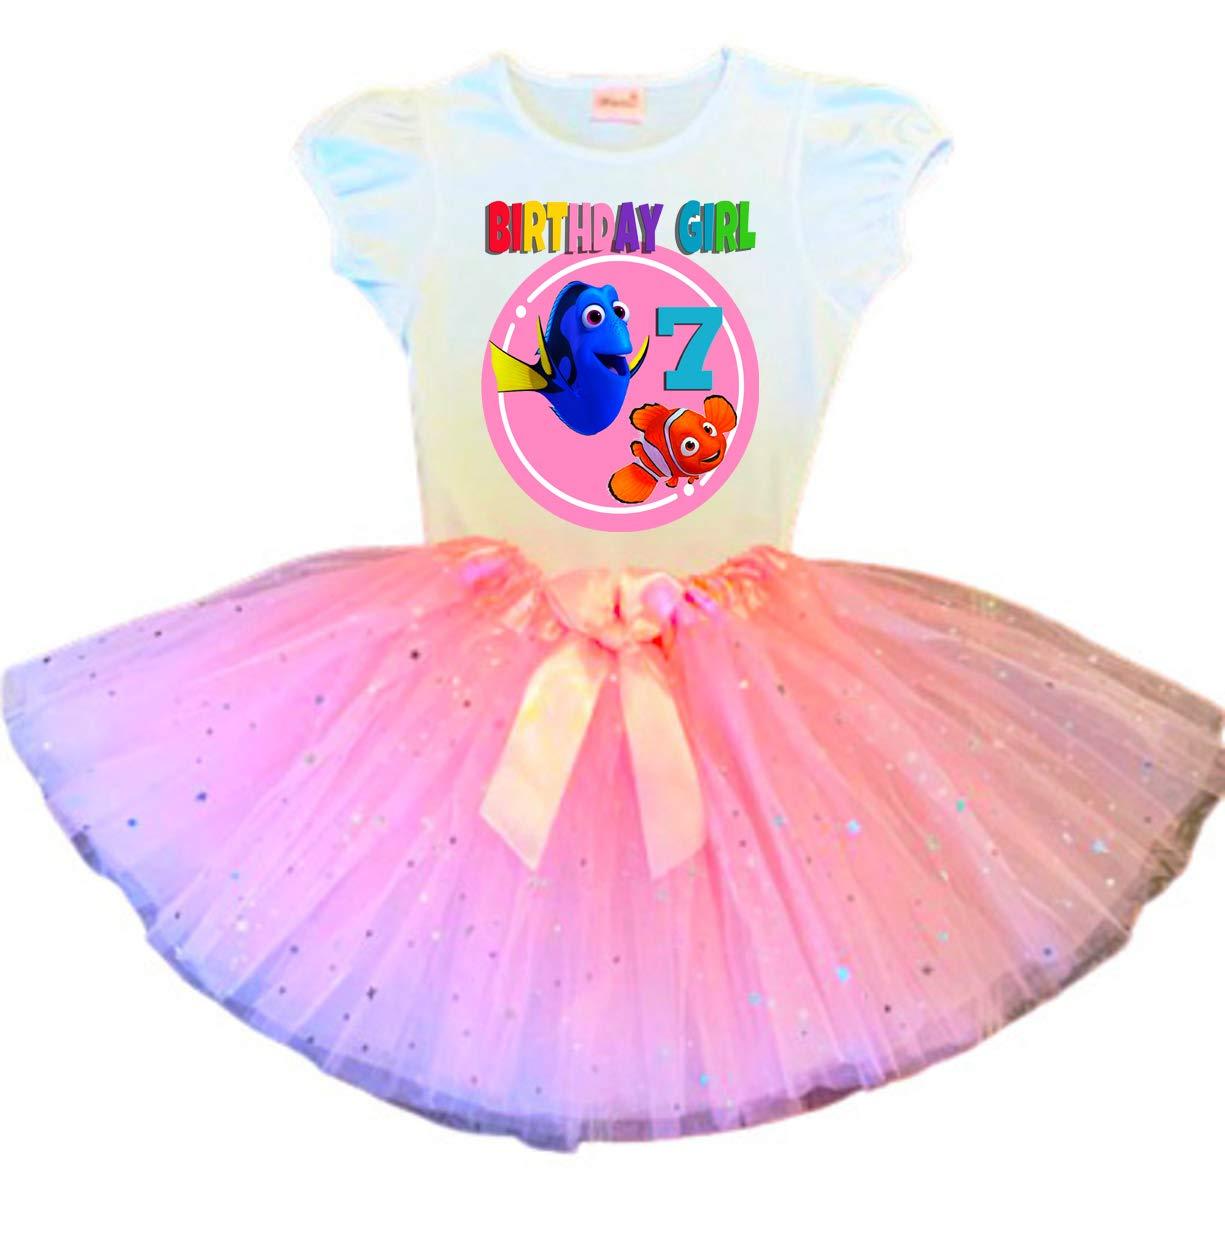 SALENEW very popular! Dory and Nemo Birthday Tutu Max 68% OFF 7th Dress Pink O Party